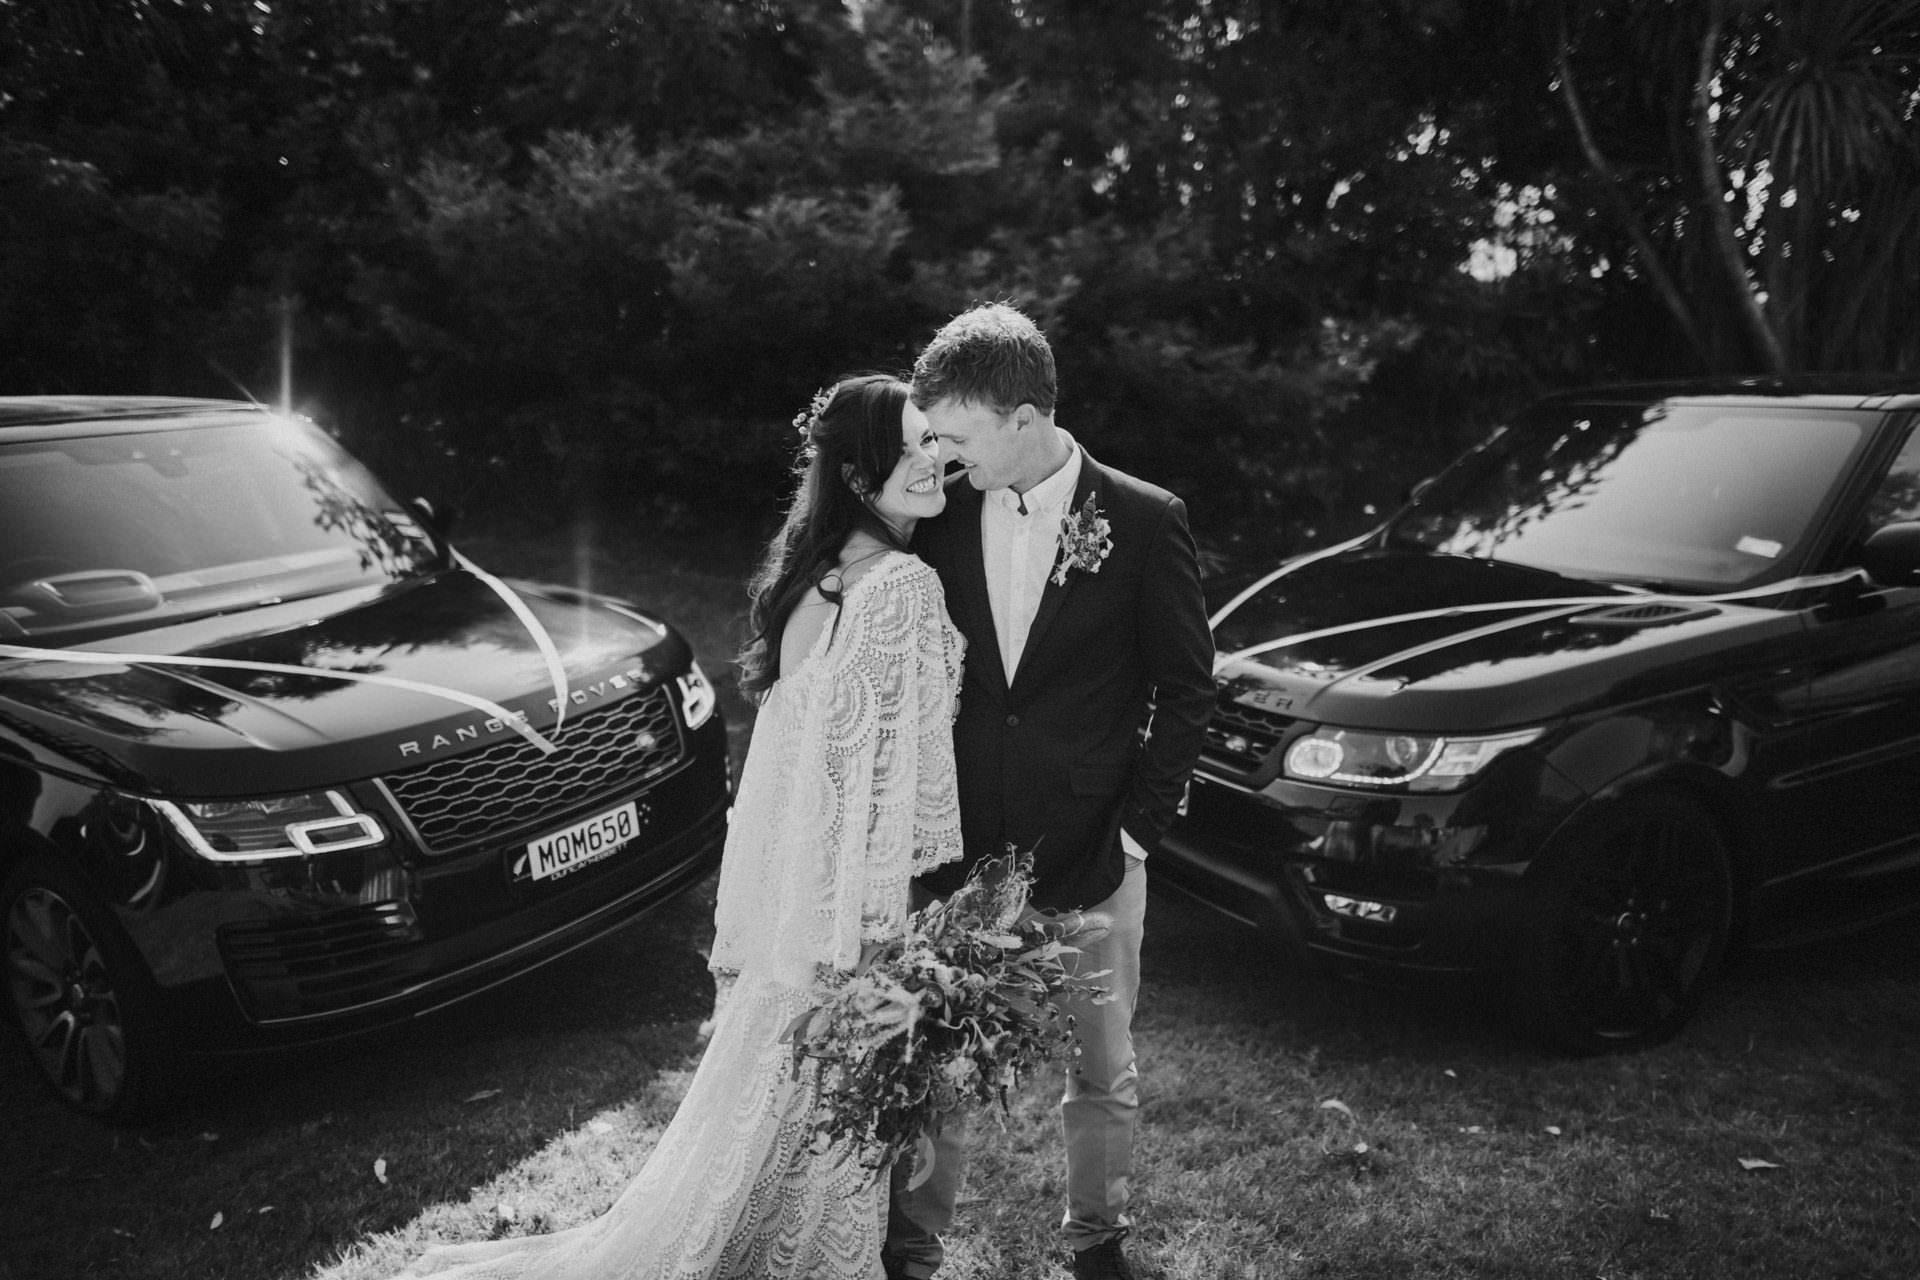 Range rover wedding car hire